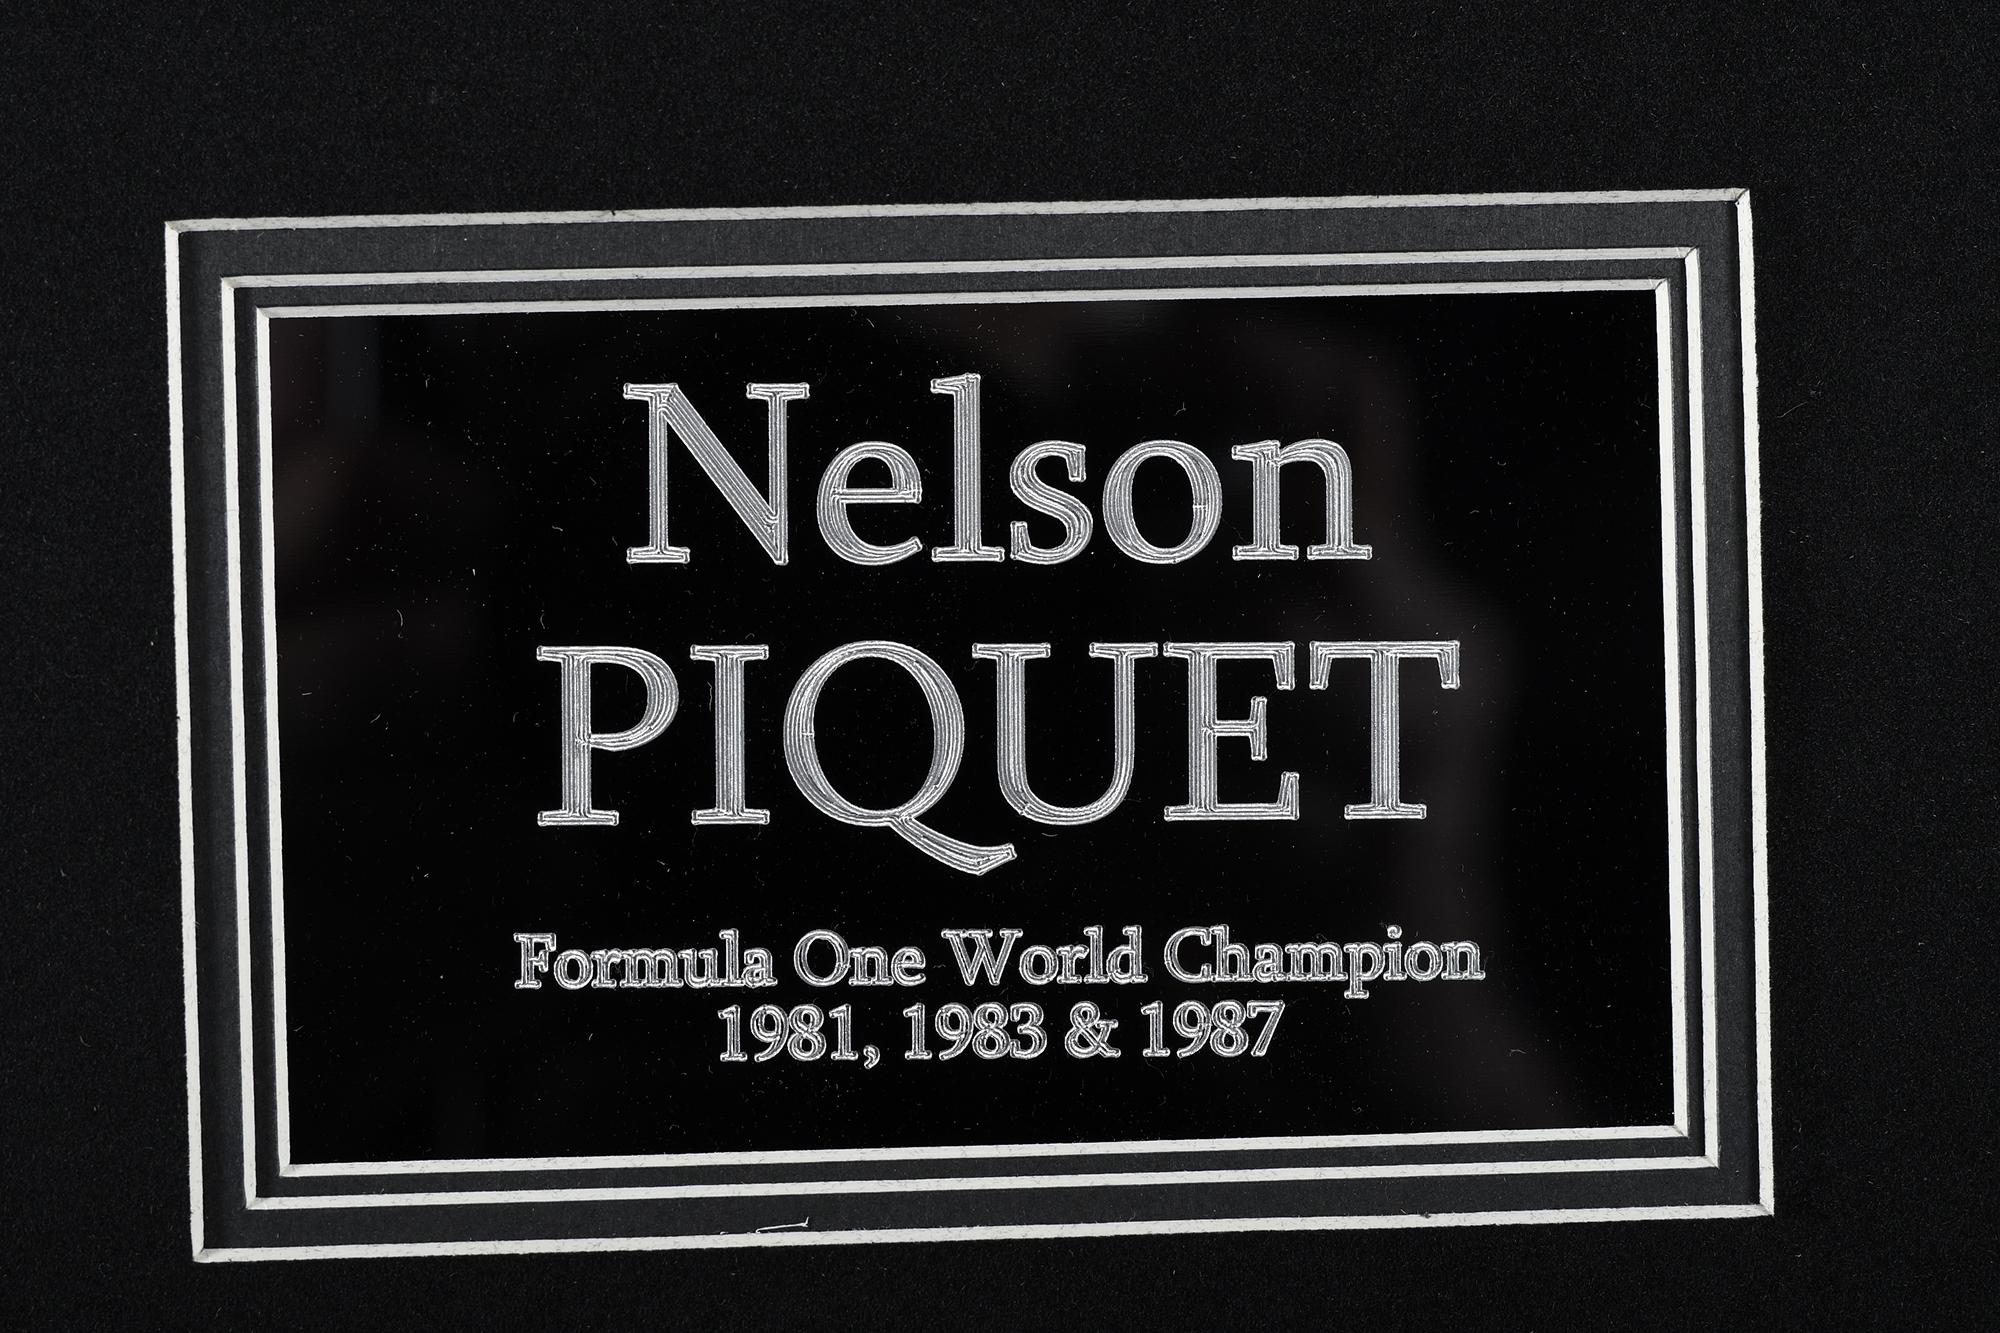 NELSON PIQUET SIGNATURE PRESENTATION - Image 4 of 4